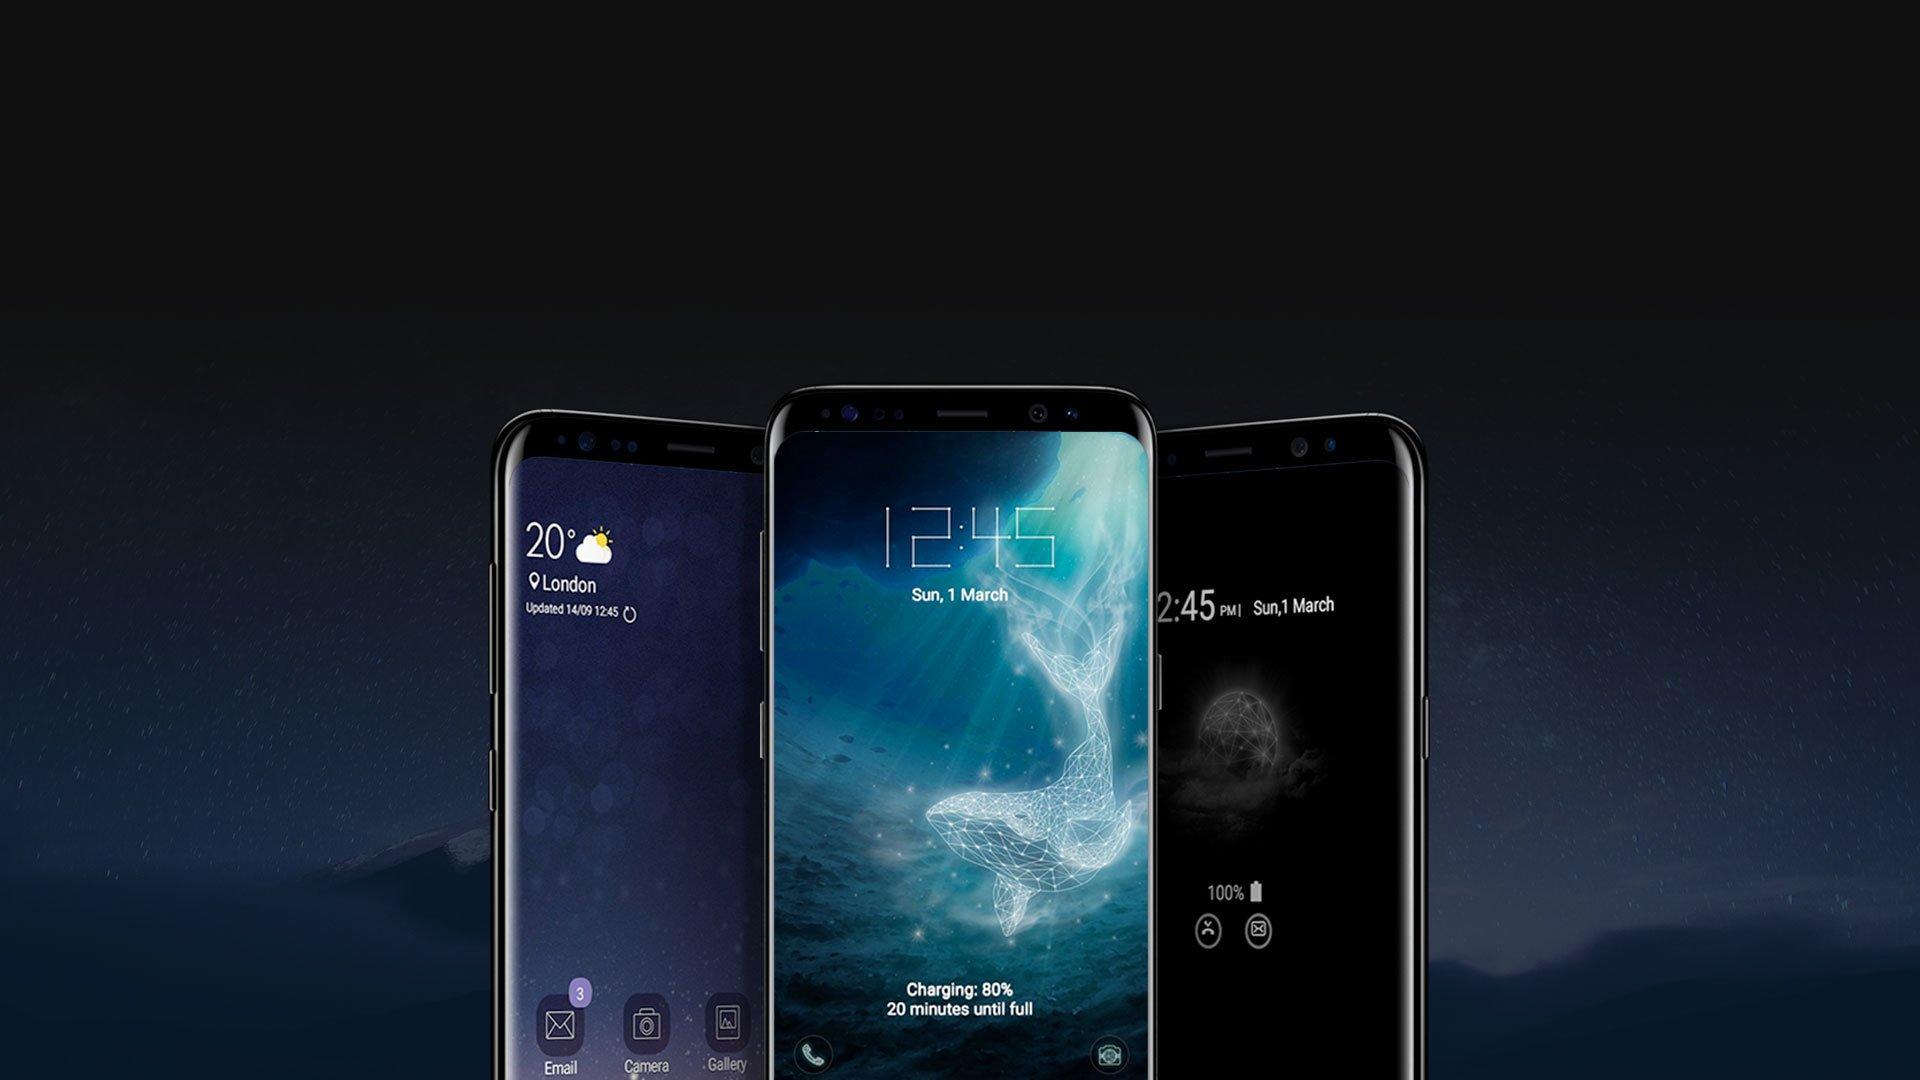 Android Search Date 2018 11 10 Bec Battery Eliminator Circuit Algunascosascom Pinterest Tabletowopl Podoba Ci Si Czarny Motyw One Ui Samsung Experience Te To Potrafi